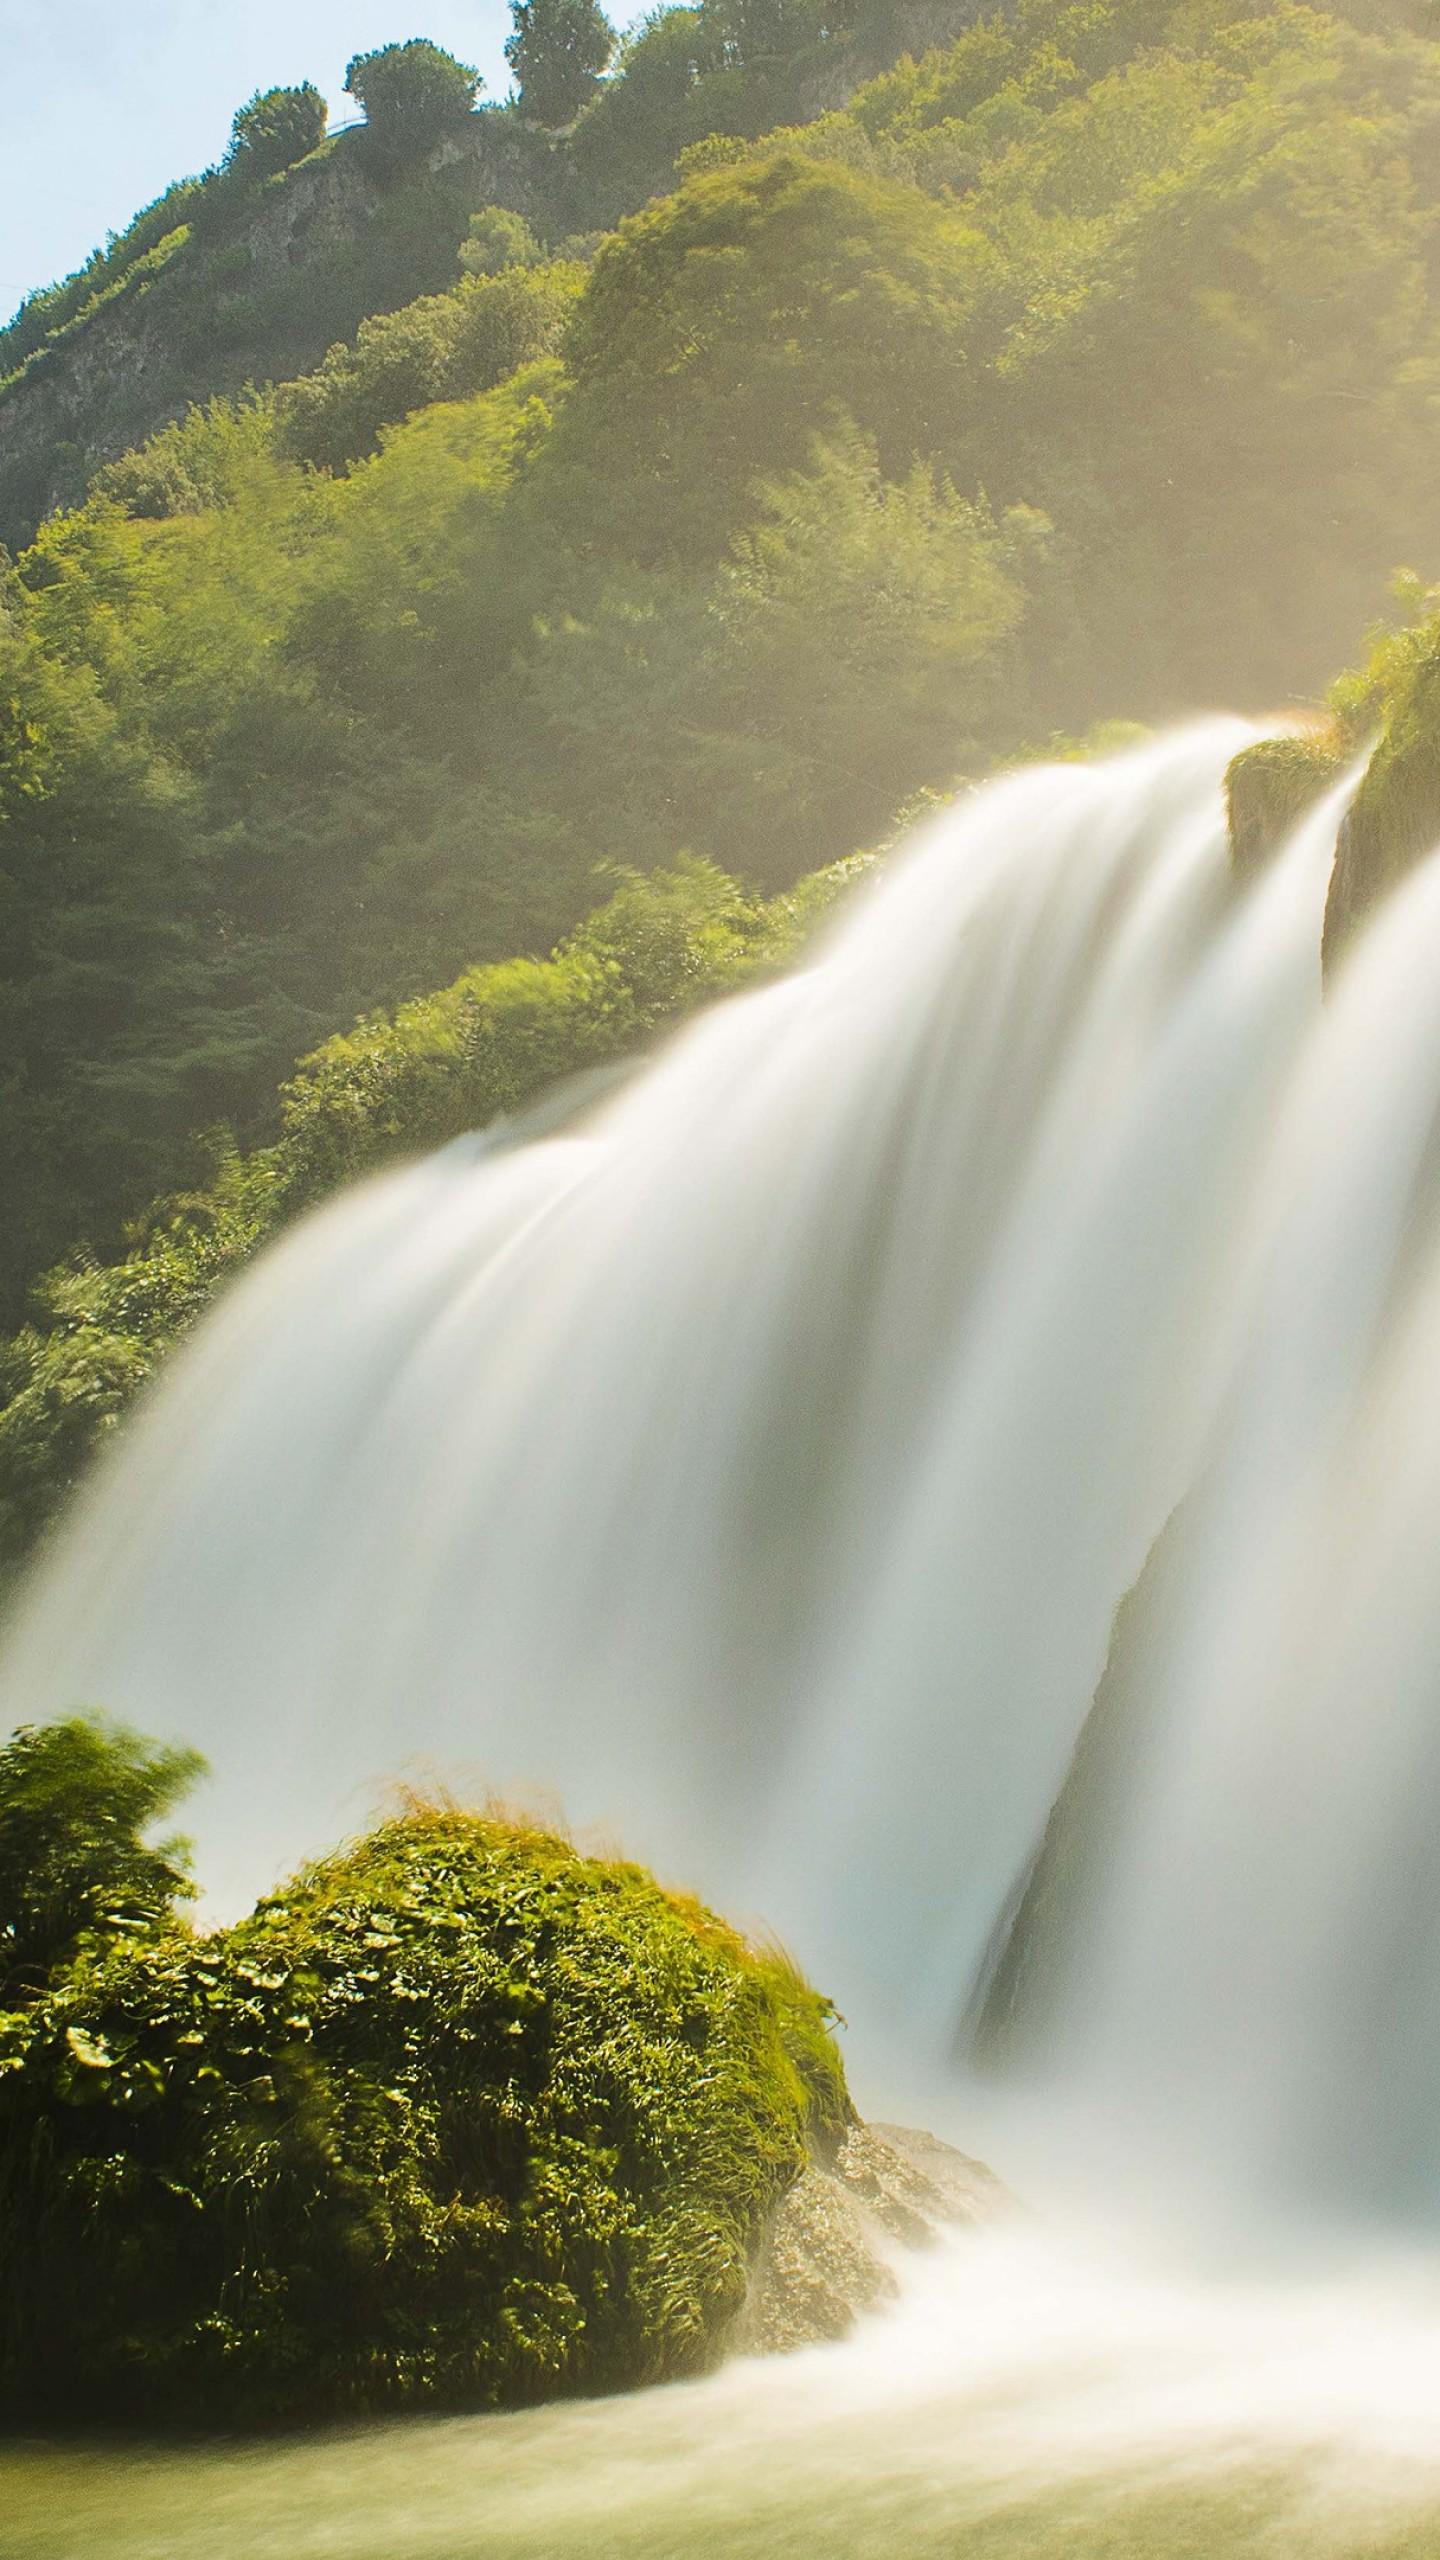 عکس زمینه آبشار خروشان تابستانی پس زمینه